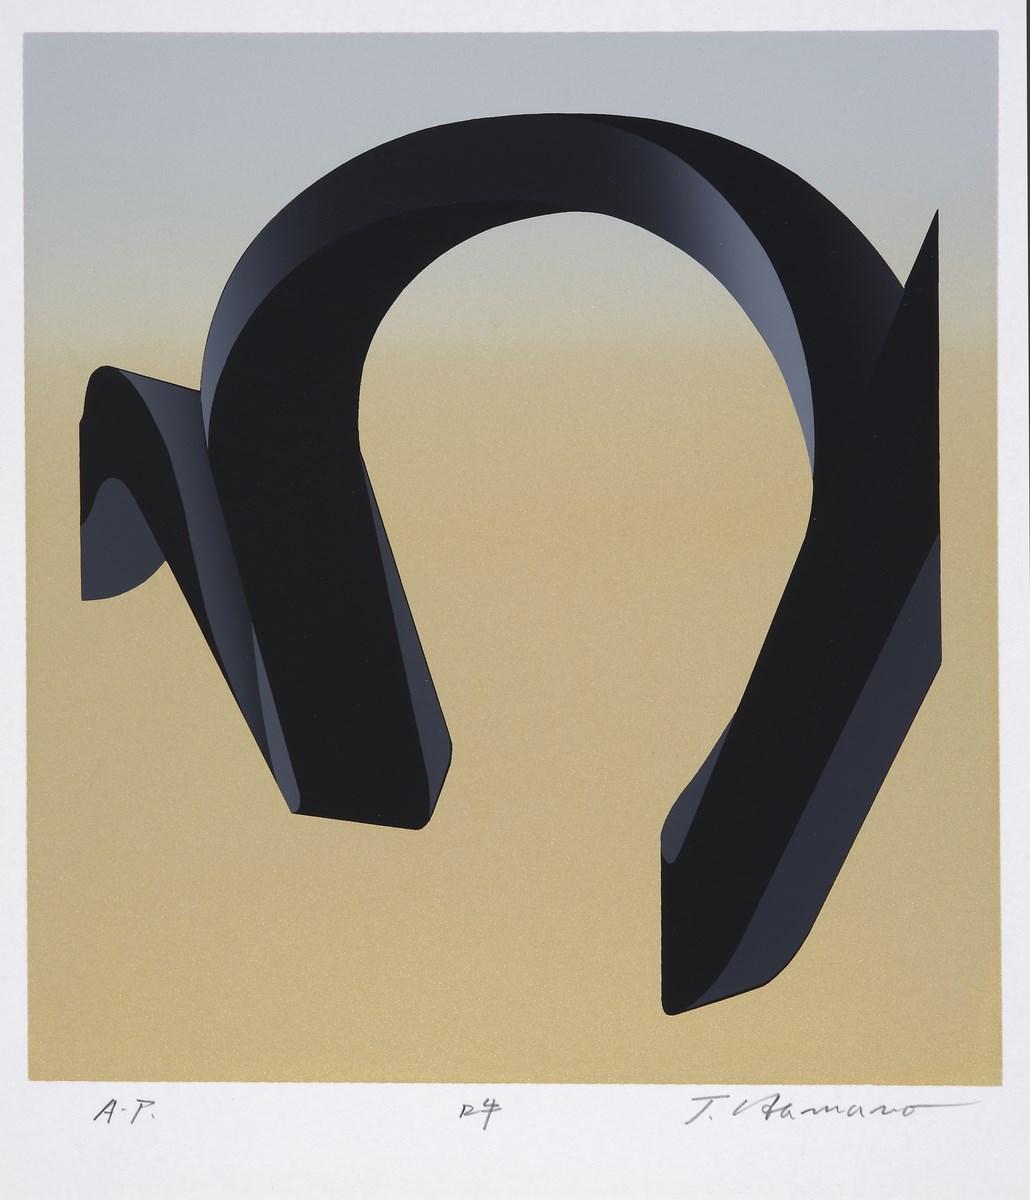 "Toshihiro Hamano, [""Omega""], 2006 (źródło: materiały prasowe organizatora)"